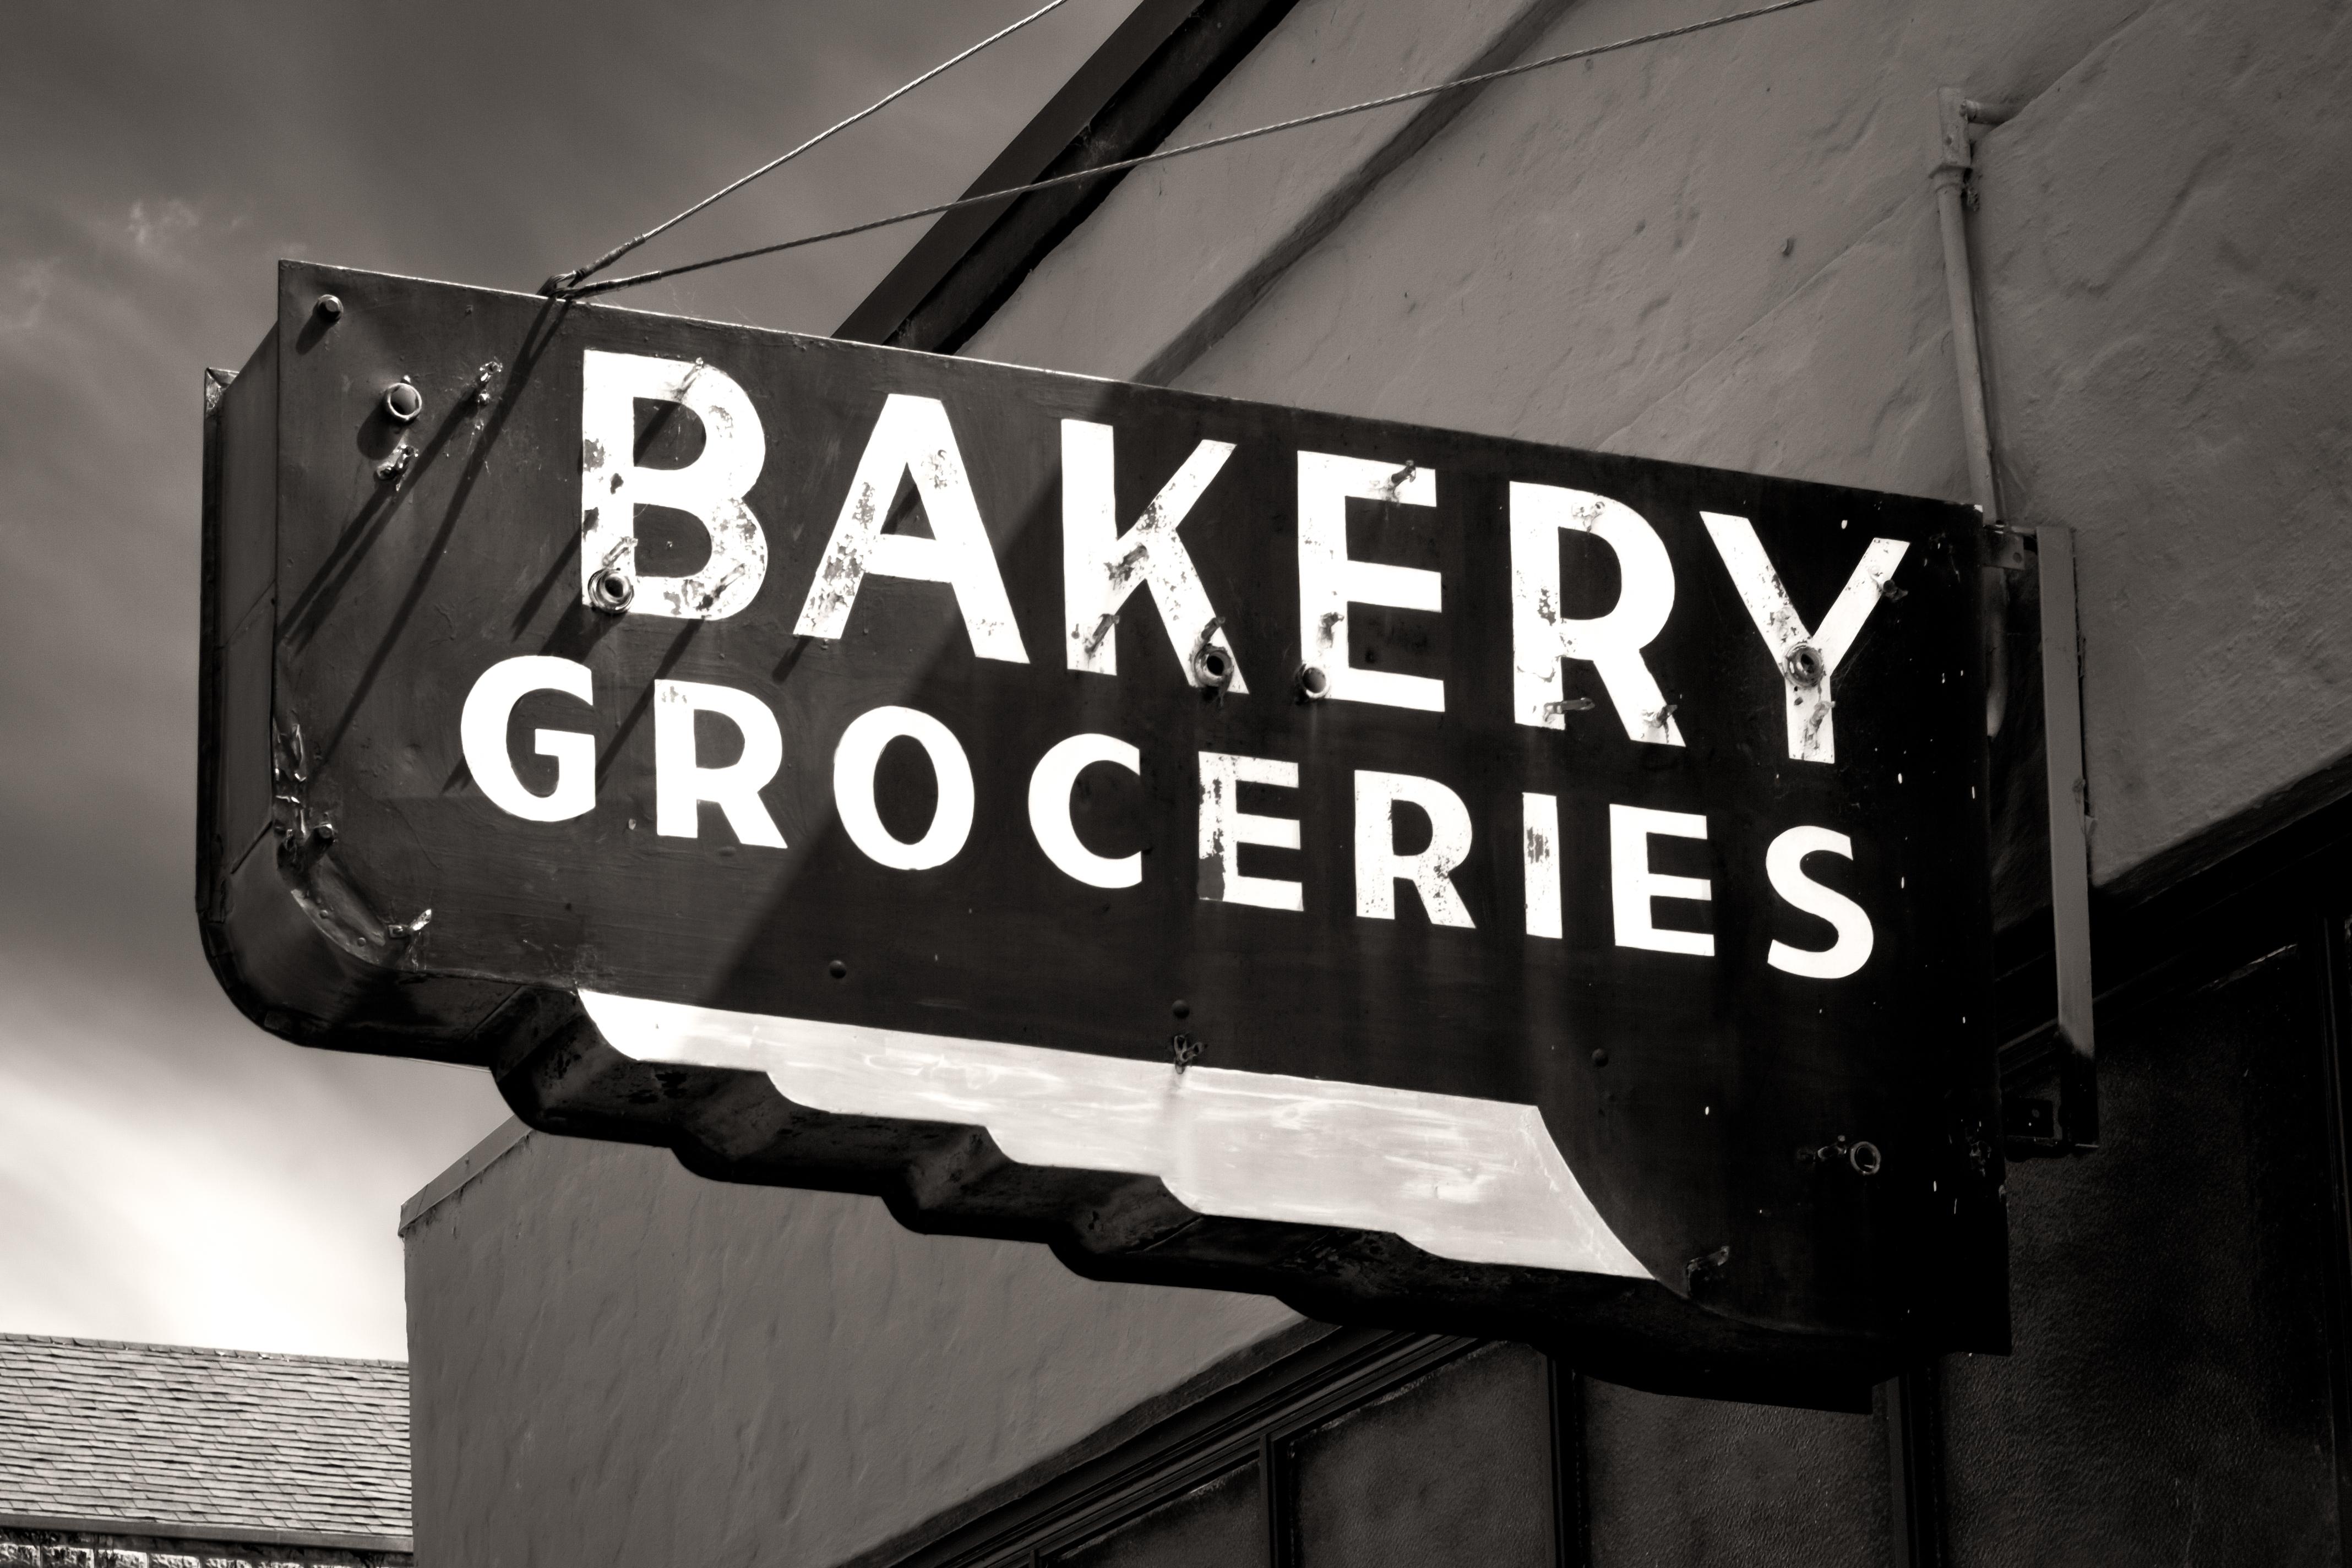 bigstock-Black-And-White-Worn-Bakery-An-64790674